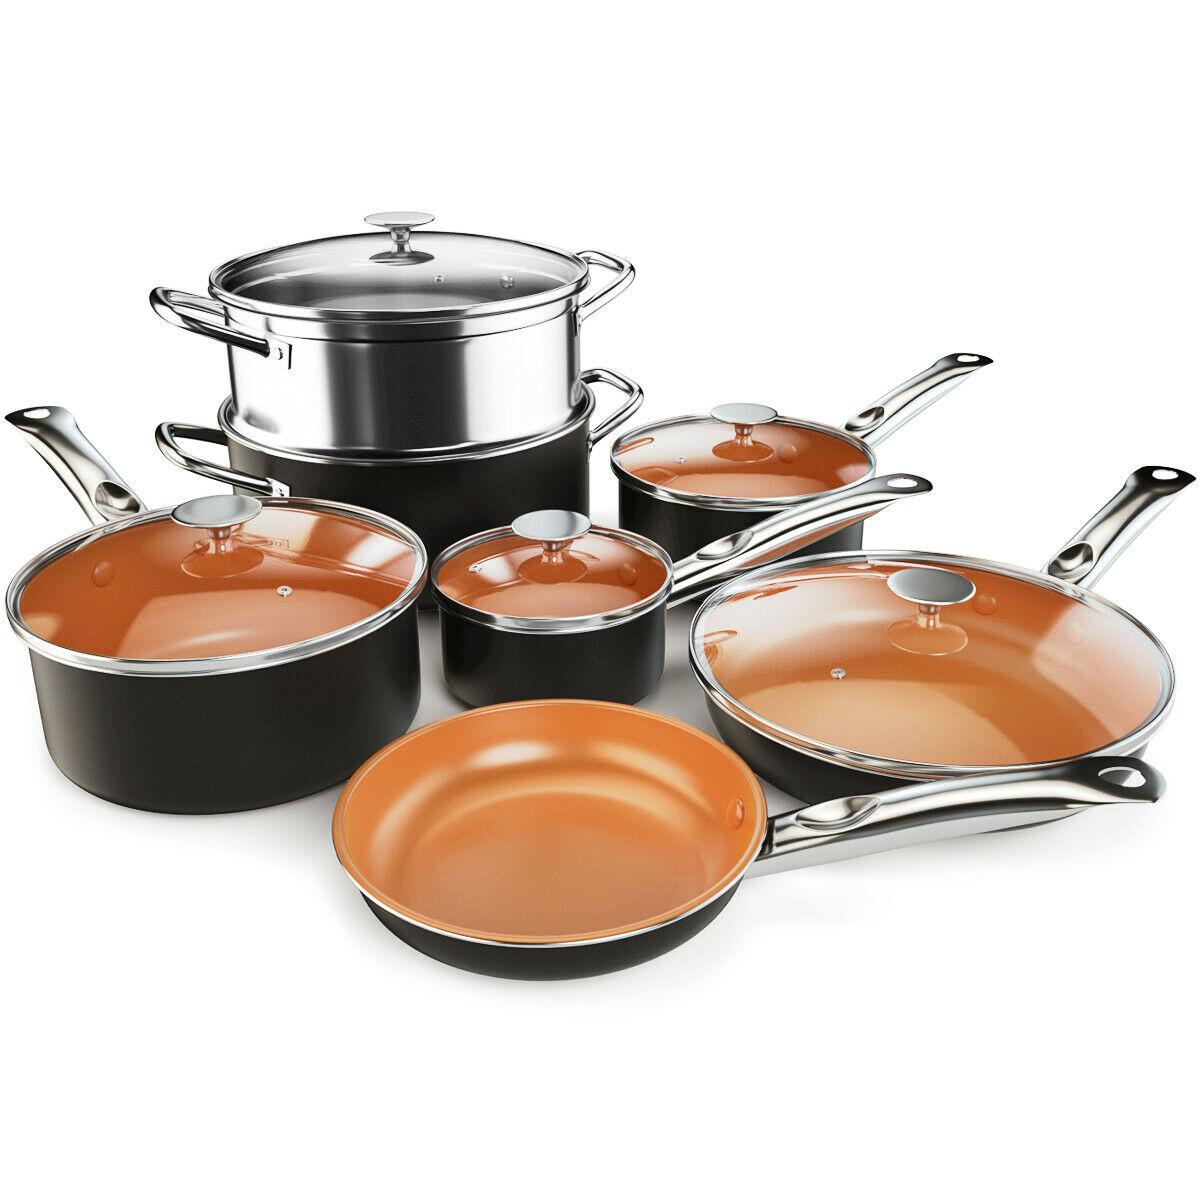 12 Piece Nonstick Cookware Set Copper Pots & Pans Set Dishwasher Safe Oven Safe 1